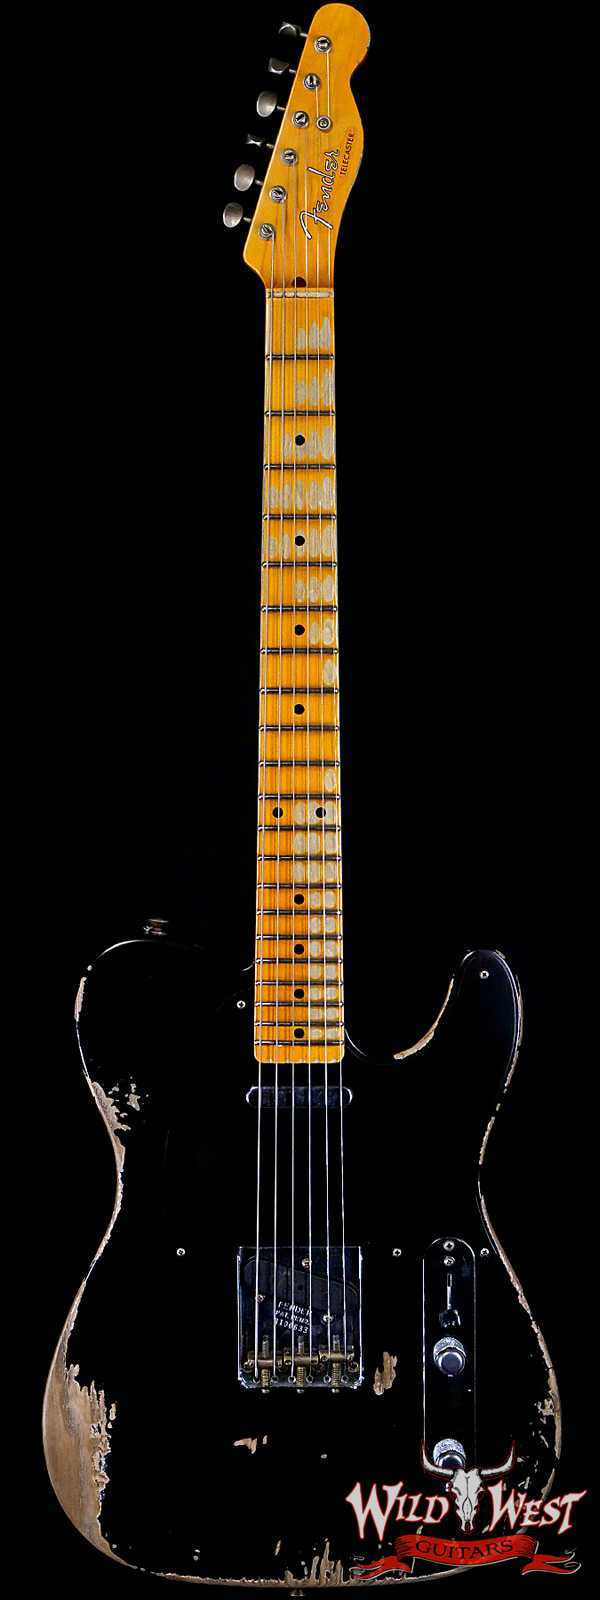 Fender Custom Shop 1952 Telecaster Maple Neck Heavy Relic Aged Black with Black Pickguard